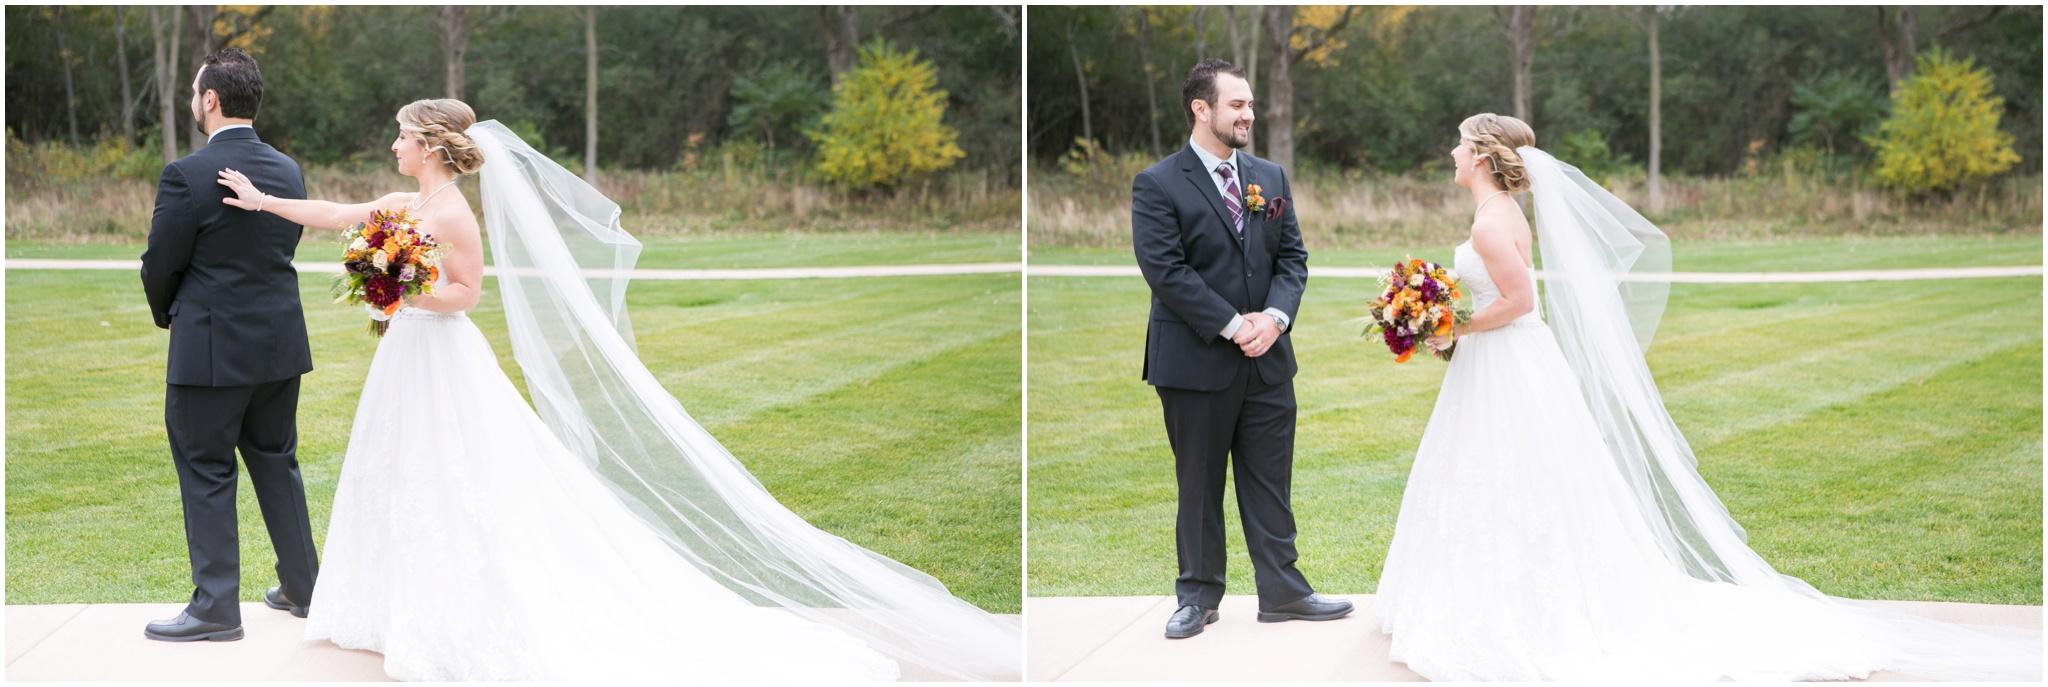 DC_Estate_Winery_Wedding_Beloit_Illinois_Wedding_0021.jpg